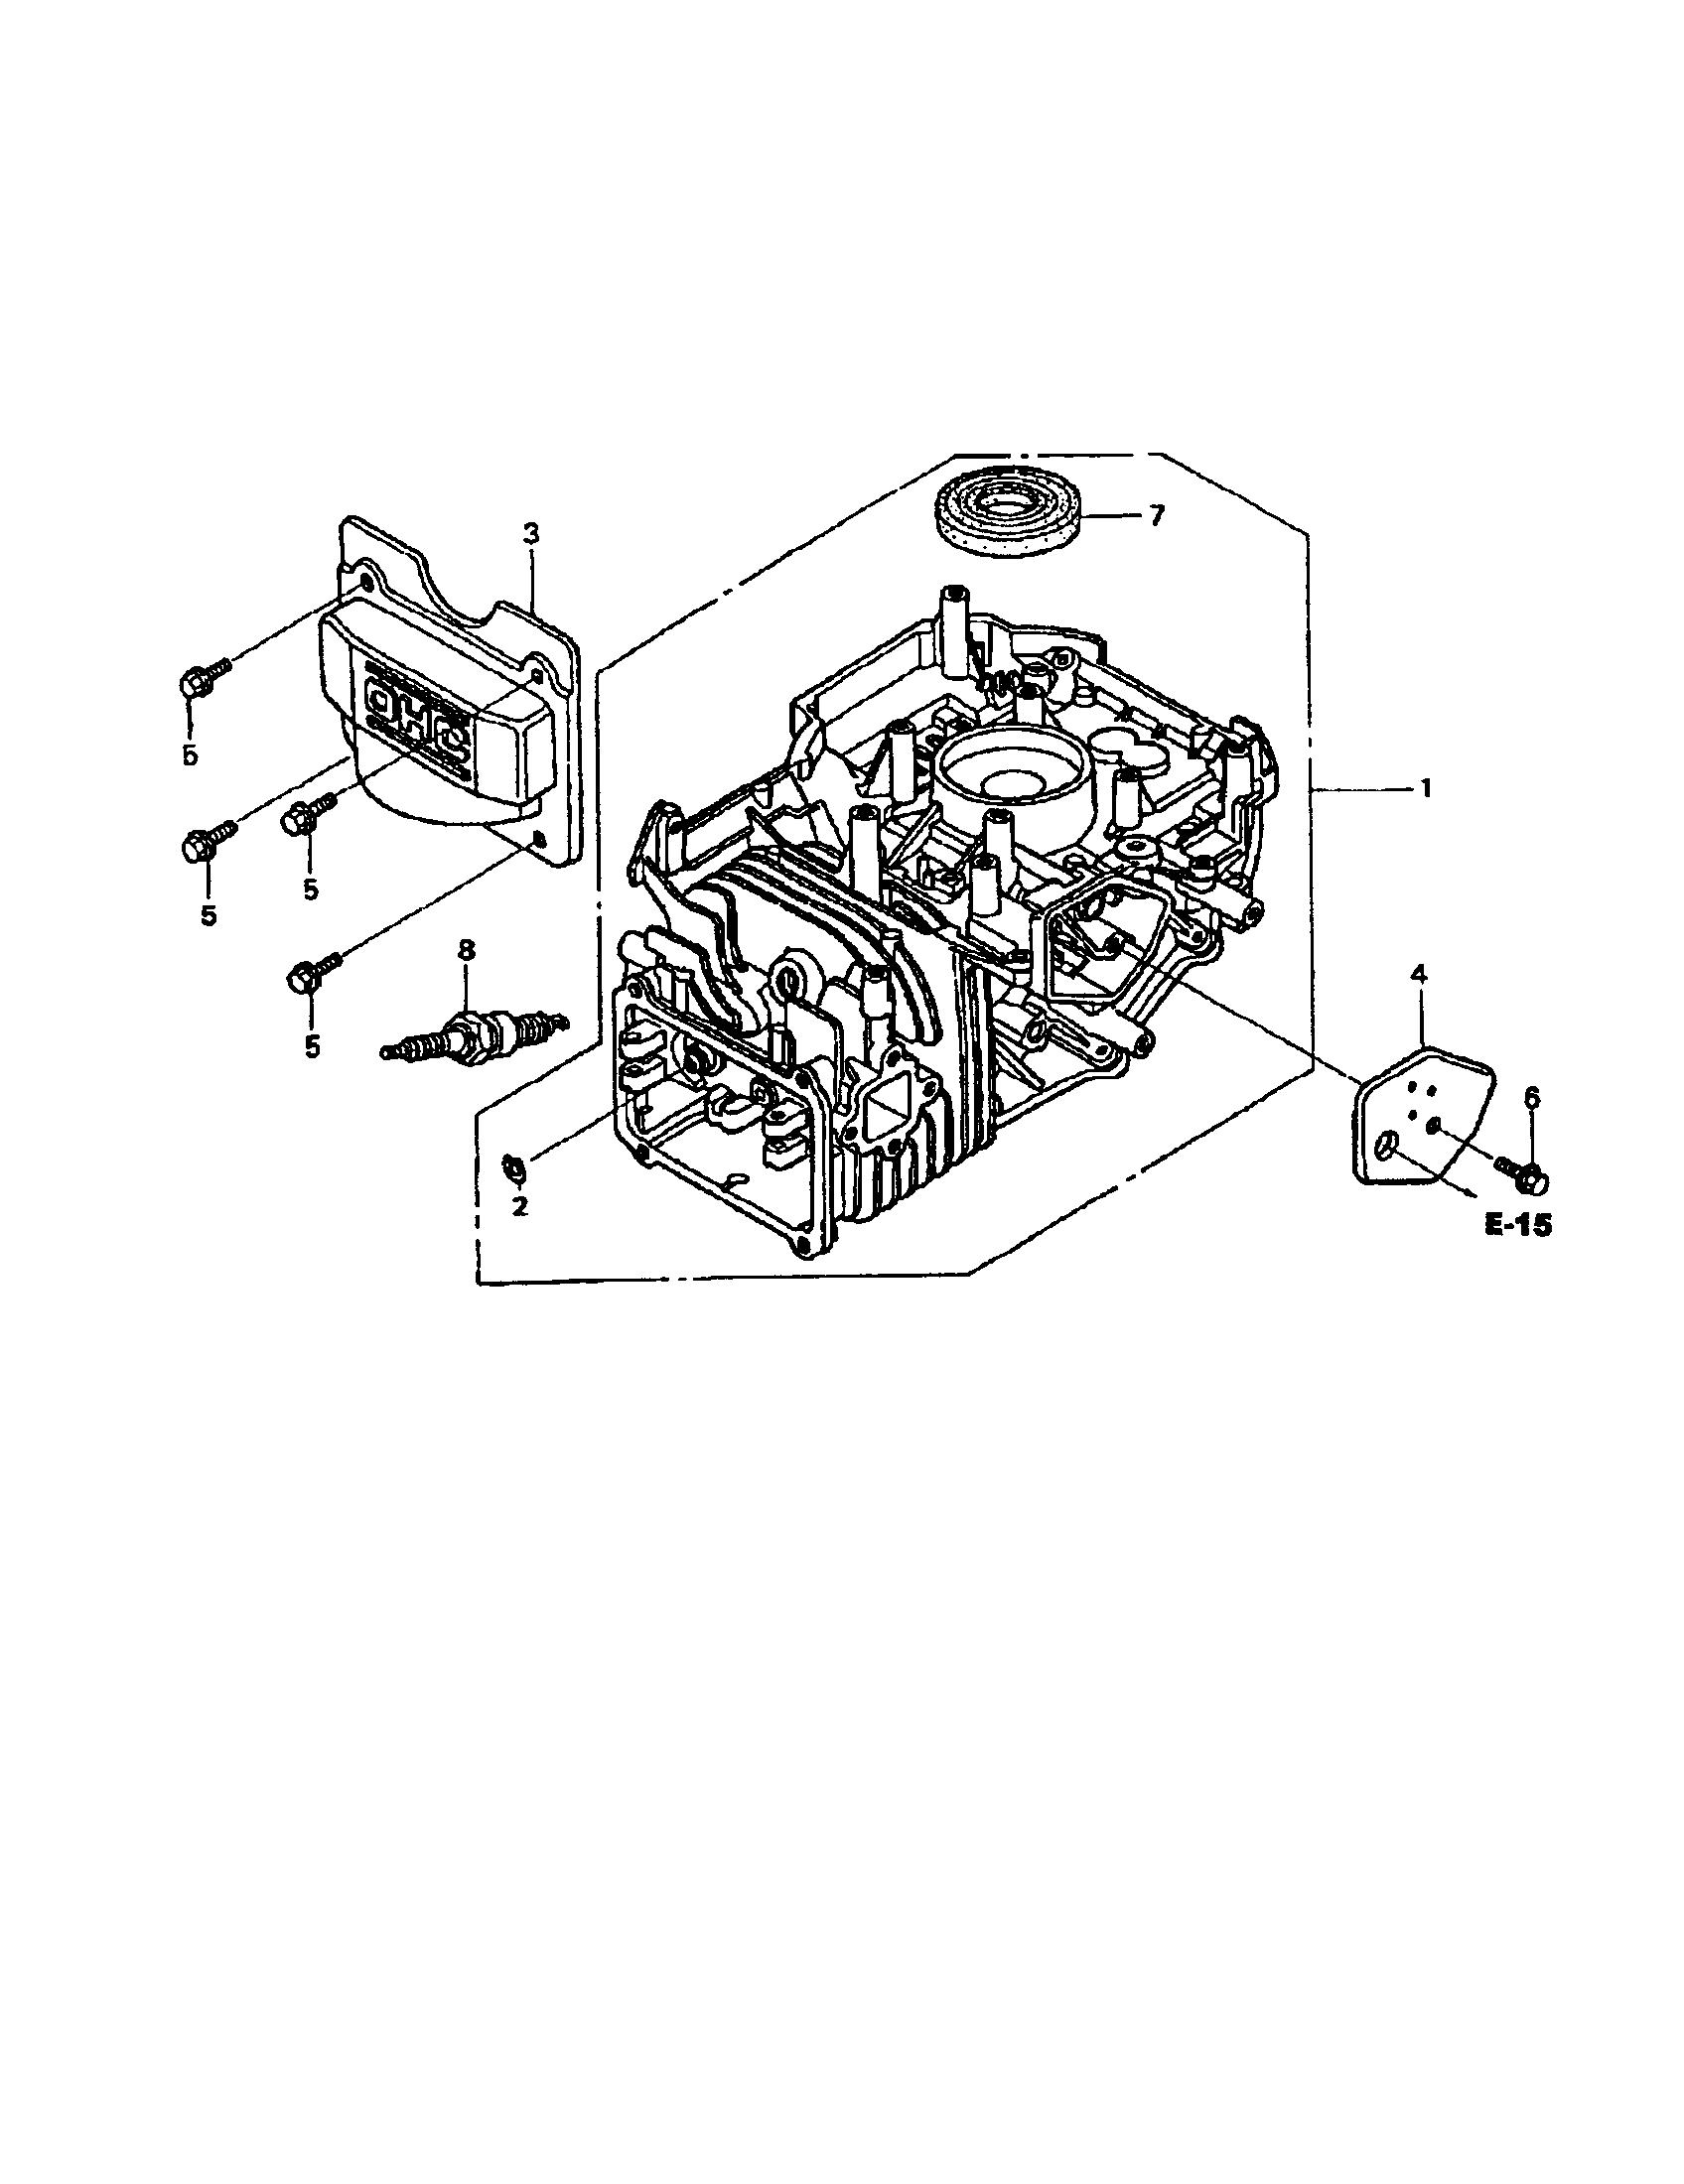 Honda Gcv190 Schematic, Honda, Get Free Image About Wiring